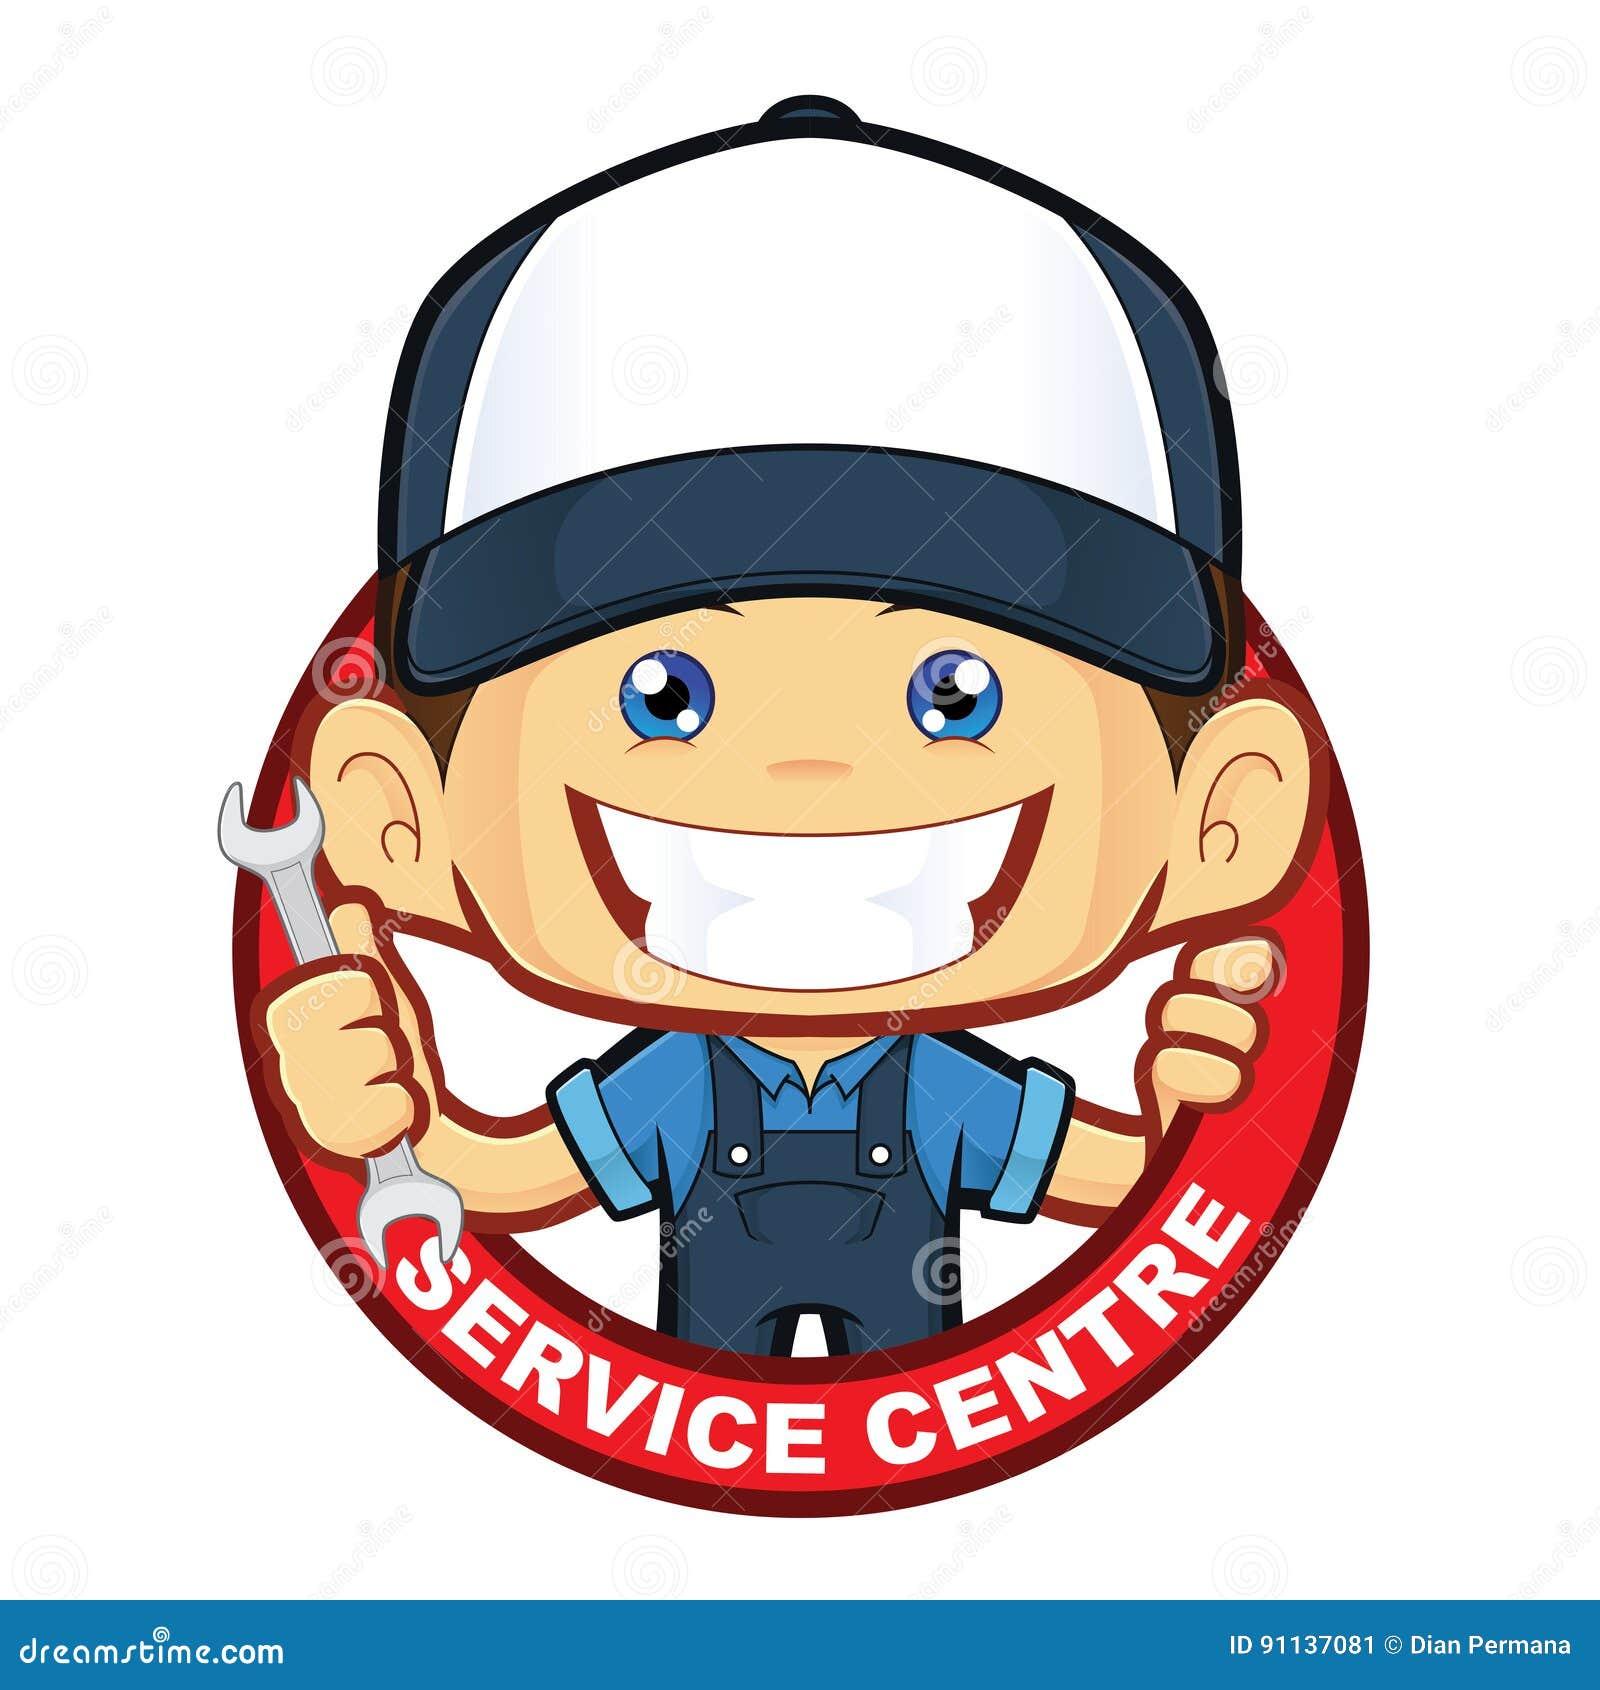 Mecânico Service Centre